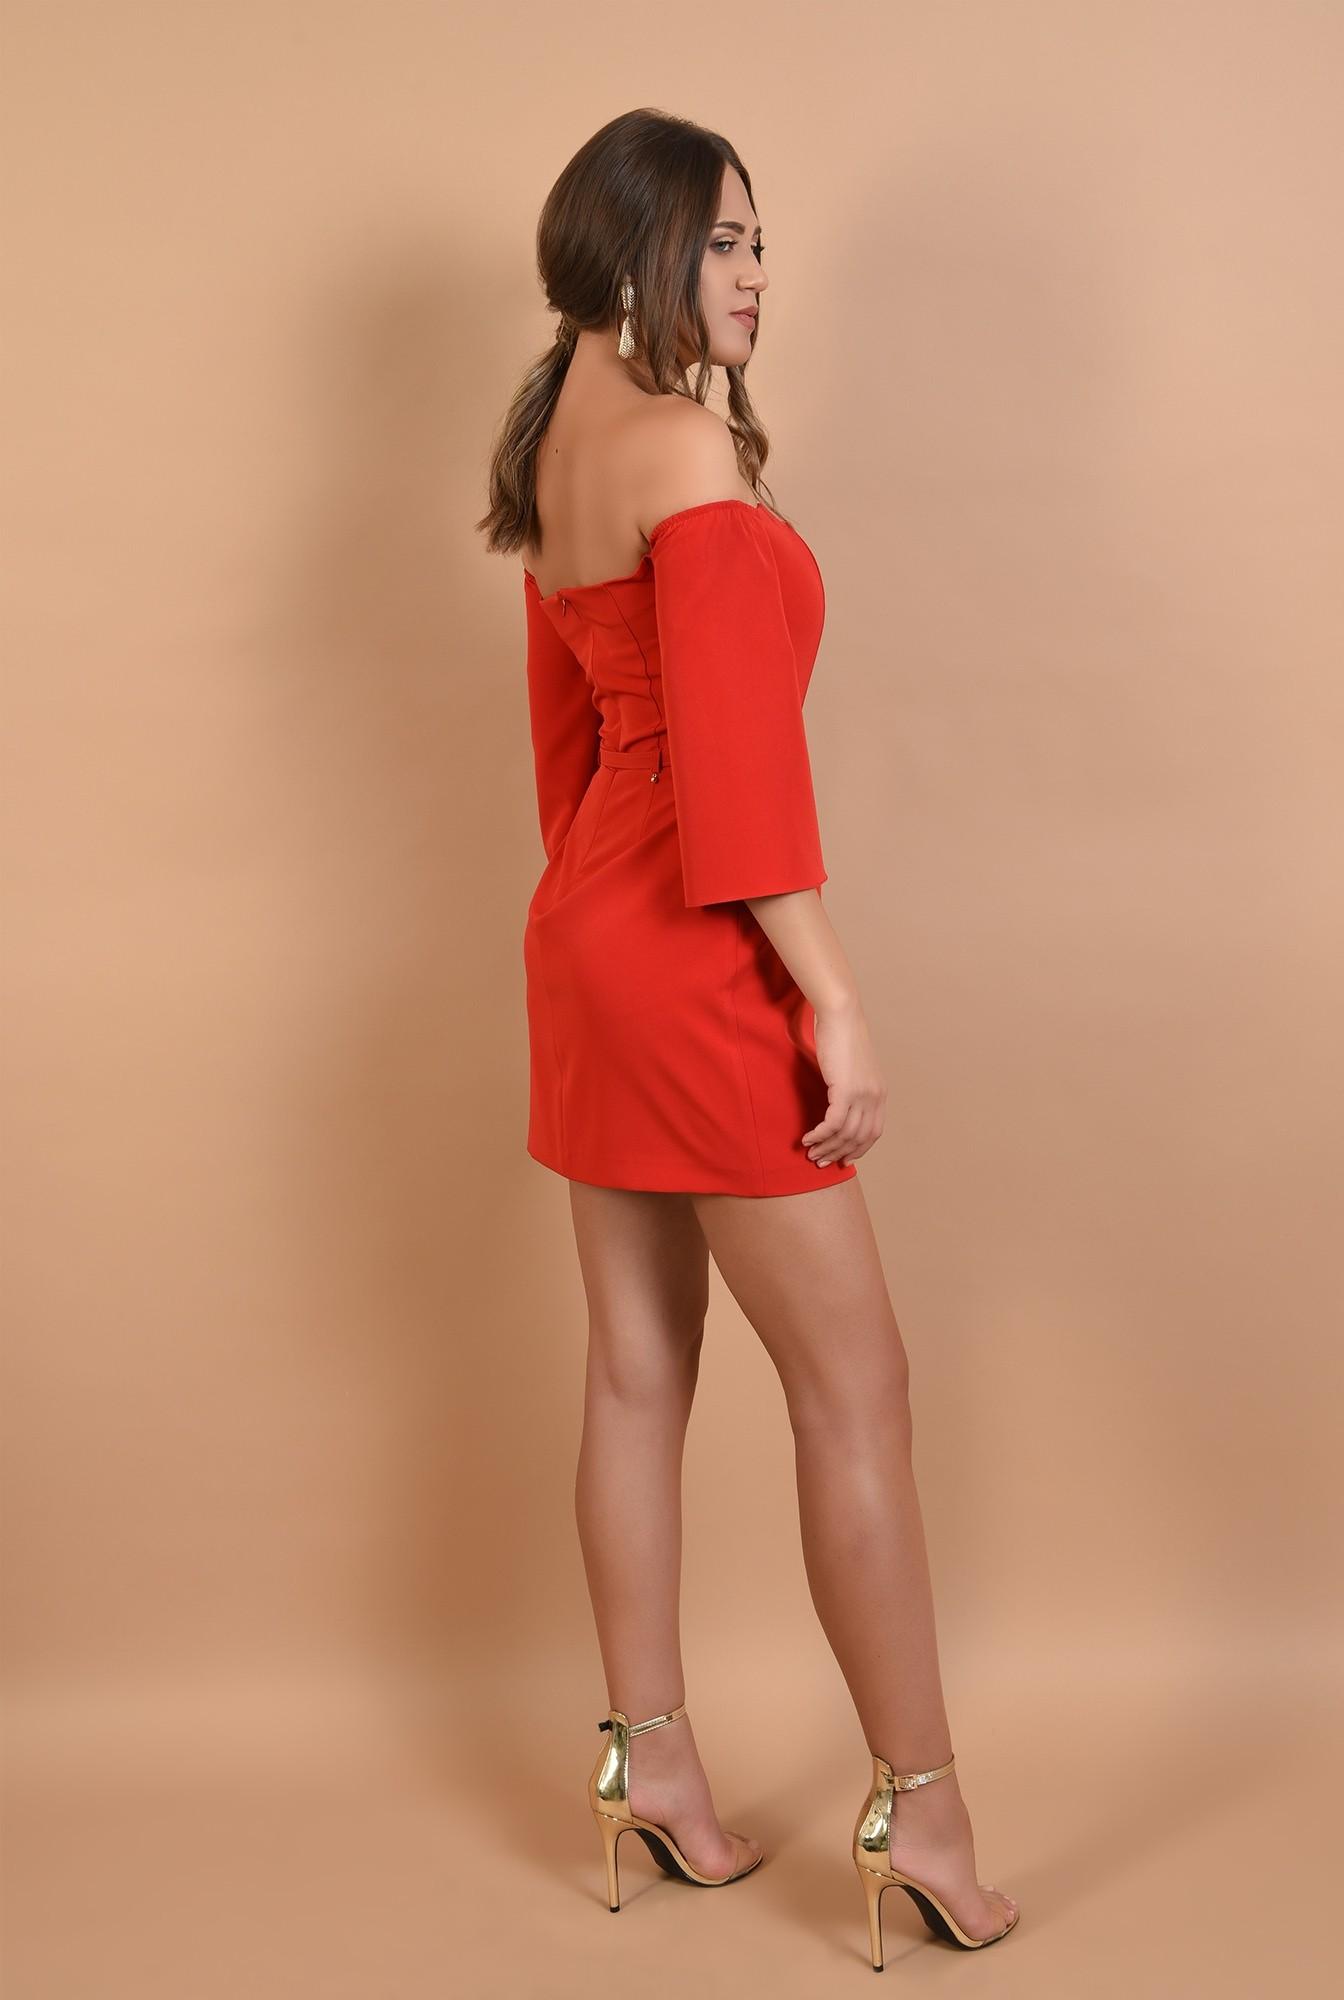 1 - rochie eleganta, mini, rosie, umeri dezgoliti, decolteu inima, Poema